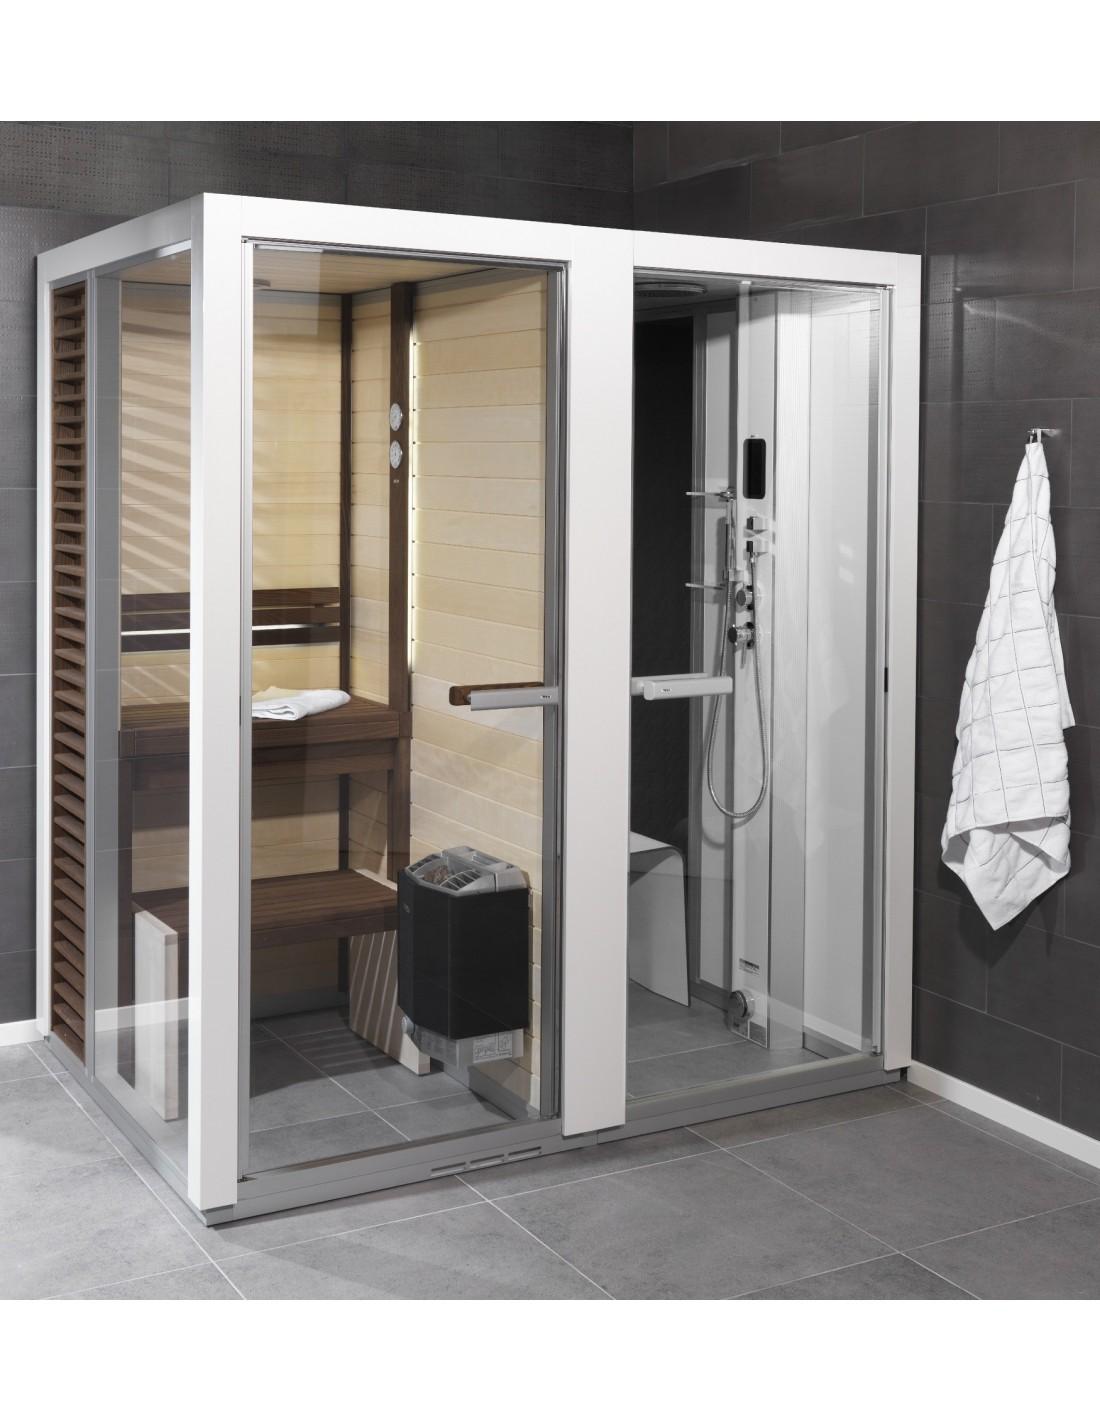 Cabina sauna y ducha de vapor - Cabina ducha sauna ...